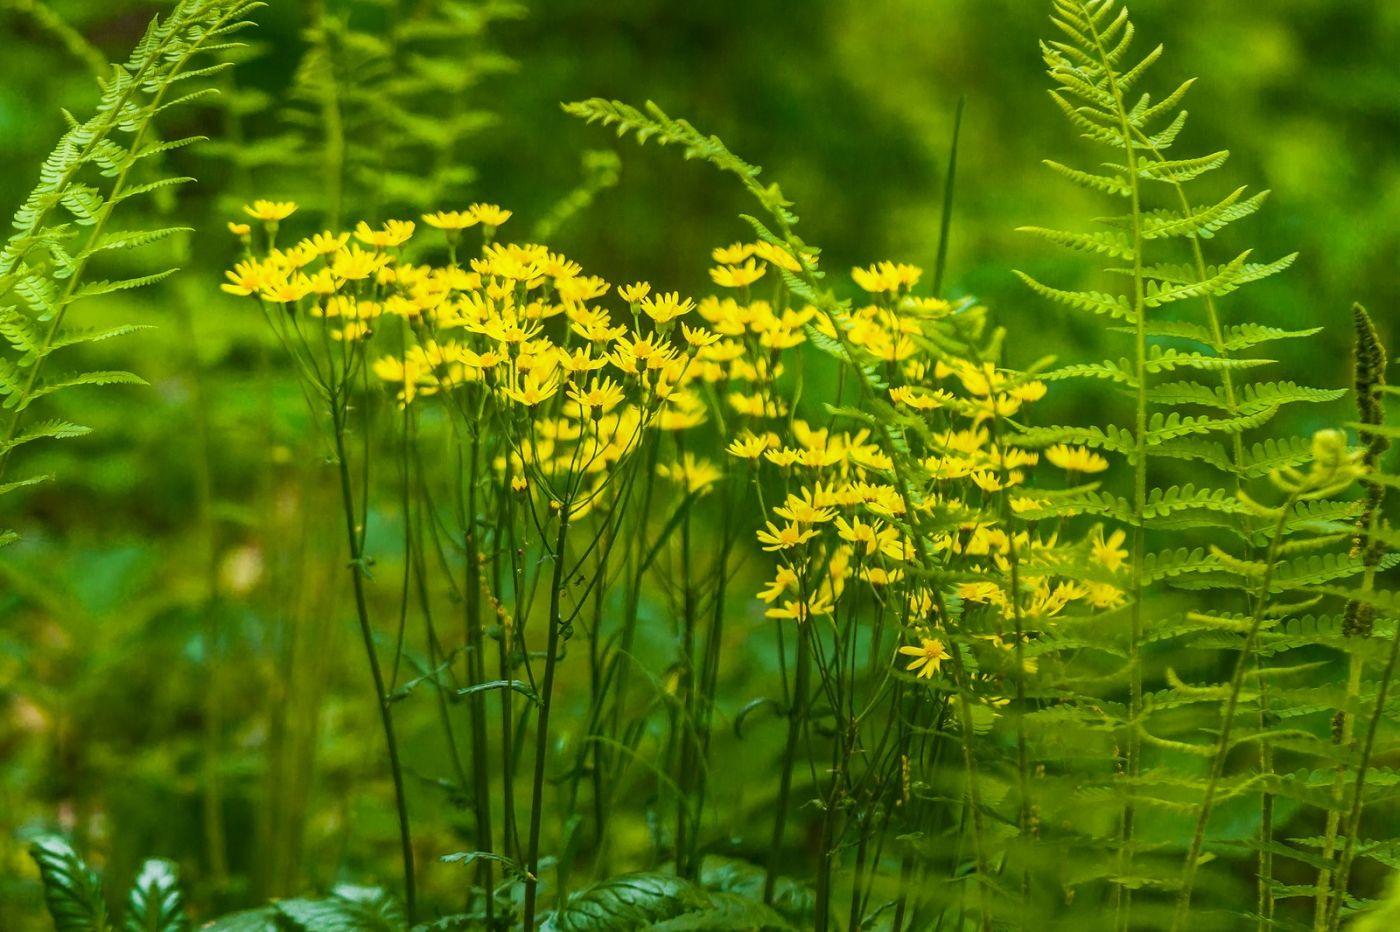 Chanticleer花园,有梦想的季节_图1-34